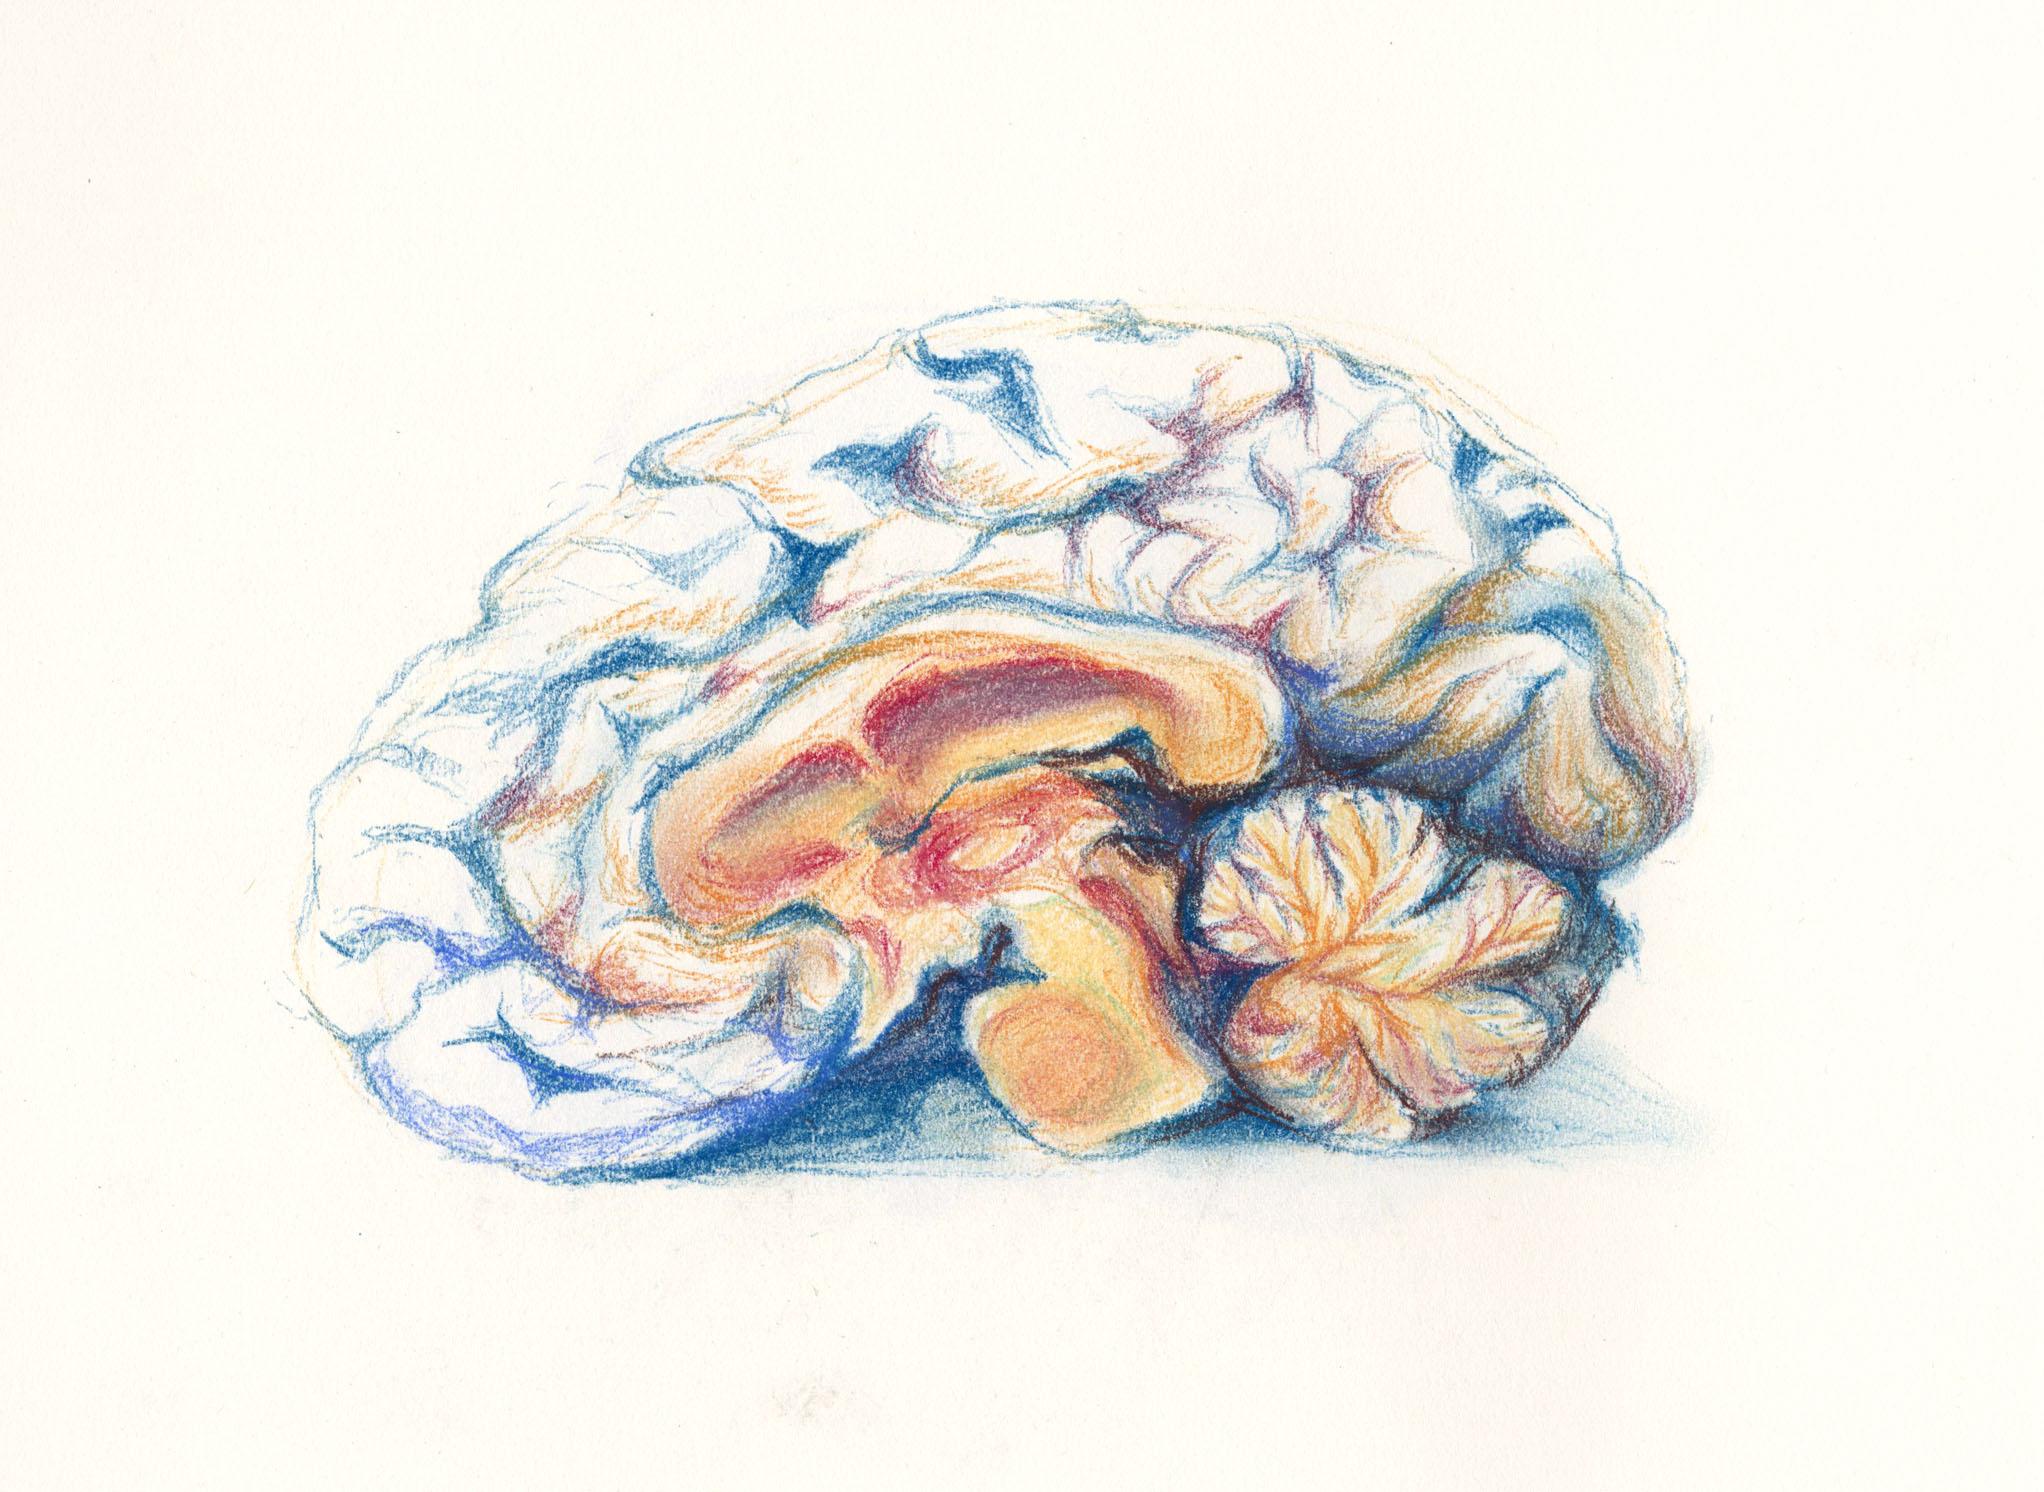 Ginny Bao, Brain